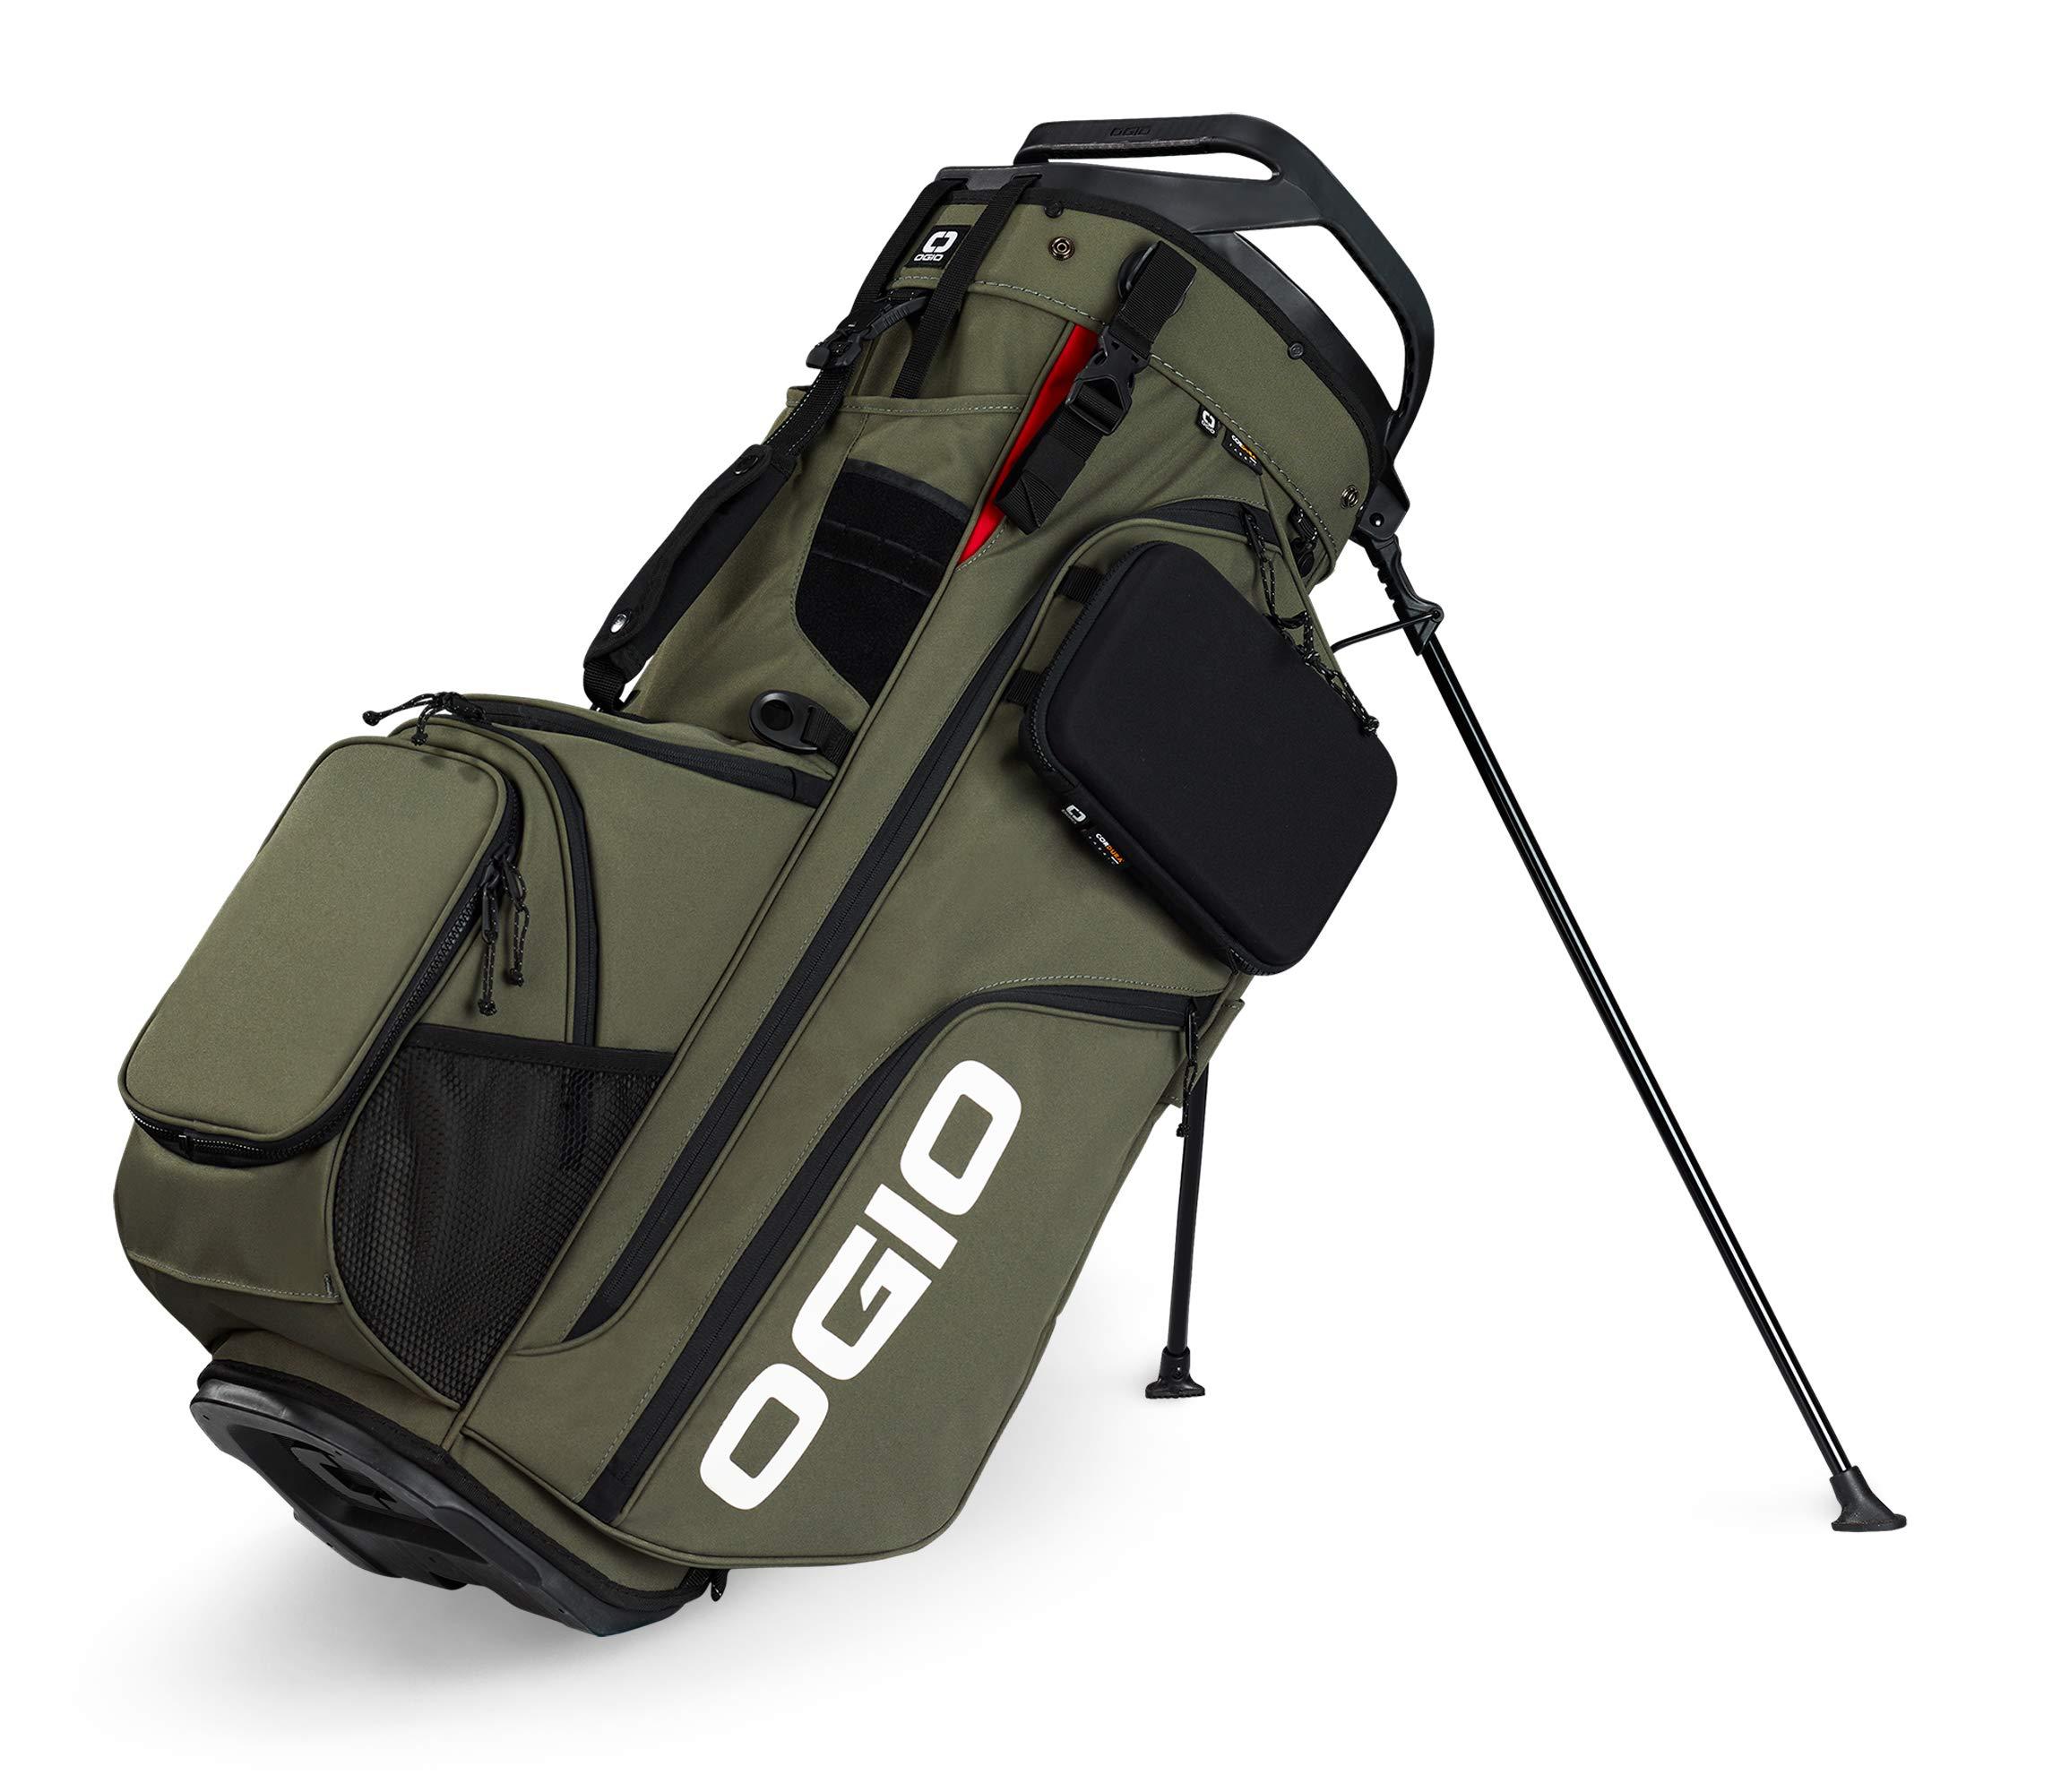 OGIO ALPHA Convoy 514 Golf Stand Bag, Olive by OGIO